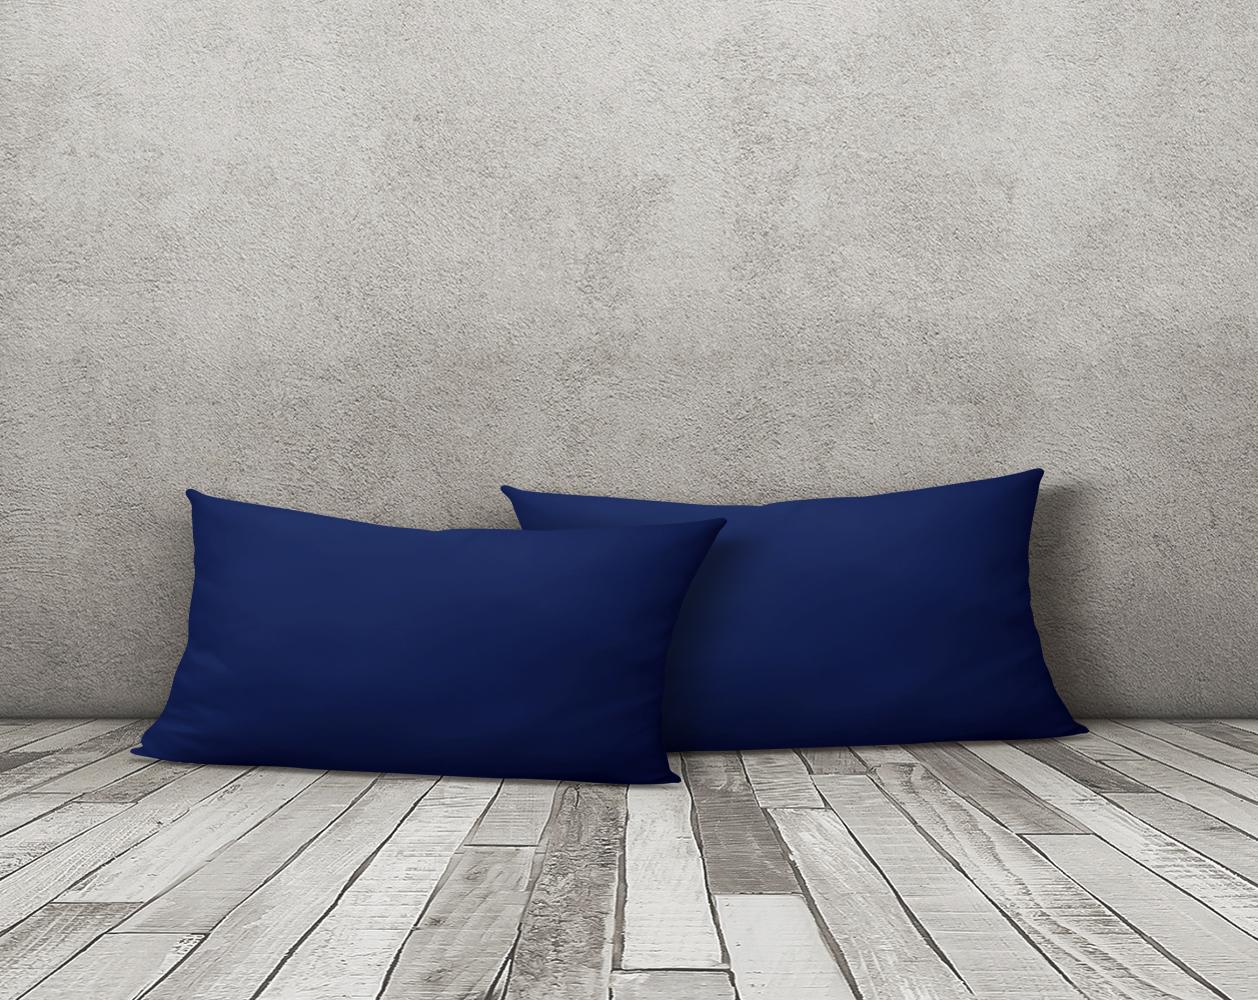 2er Set Kissenbezug Kissenhulle Kopfkissenbezug 40x80cm Navy Blau Uni Microfaser Ebay